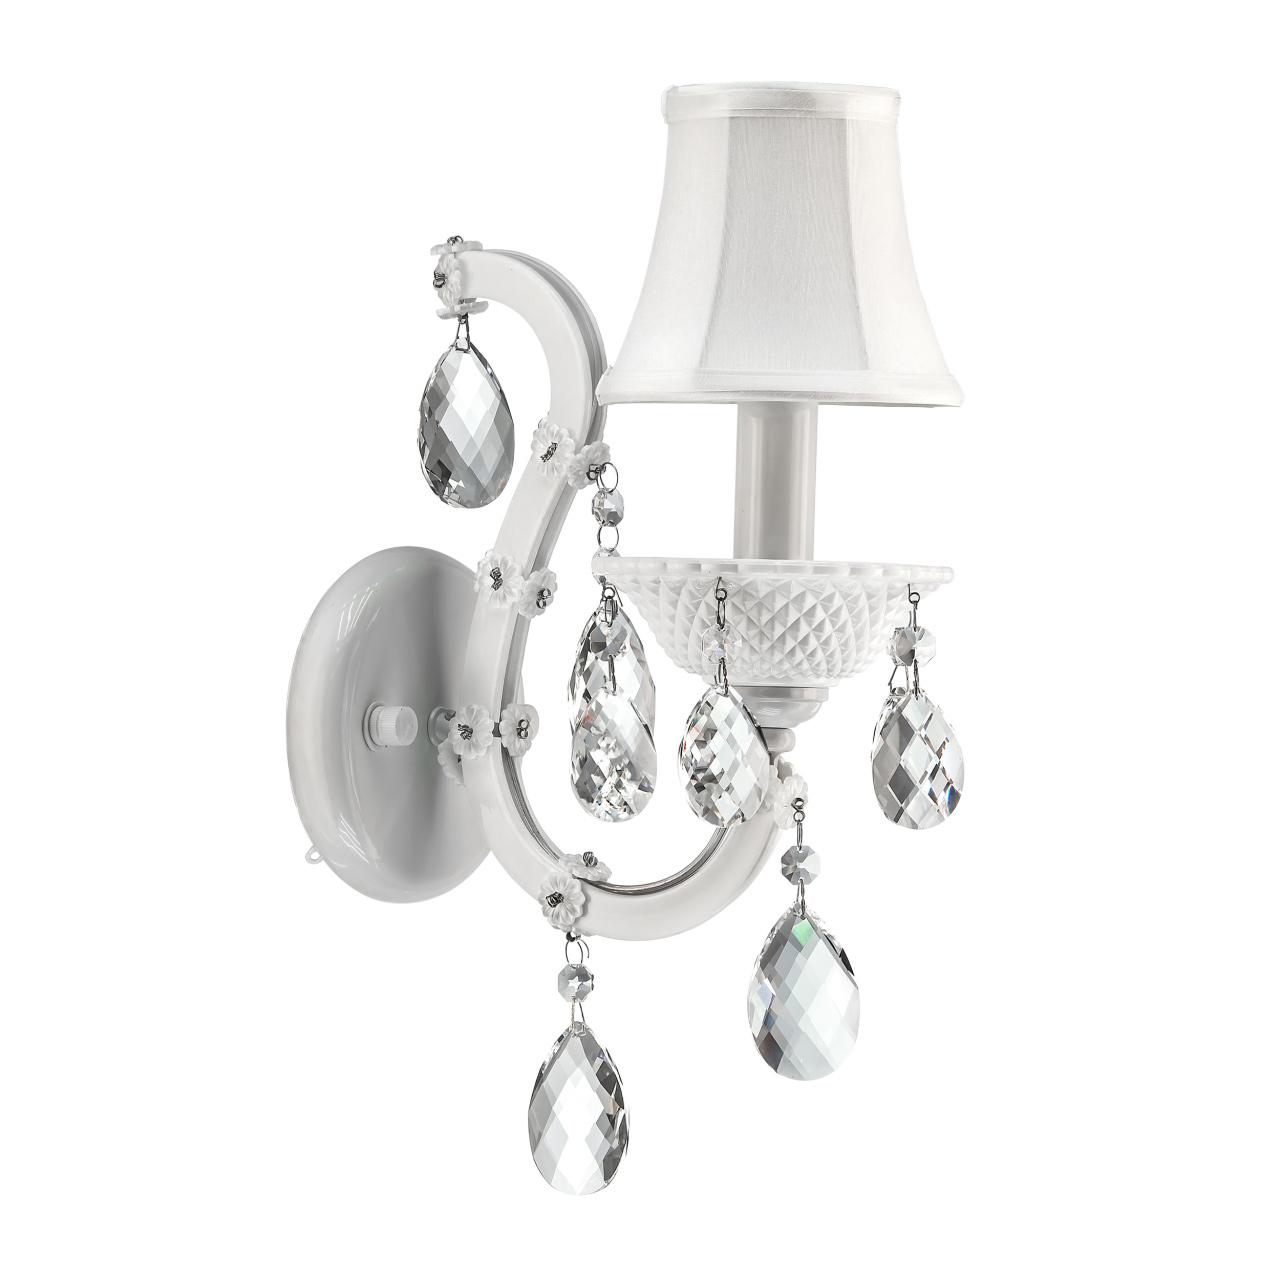 Бра Princia 1х40W E14 (основание, напатронник белый, кристалл прозрачный) Osgona 726611